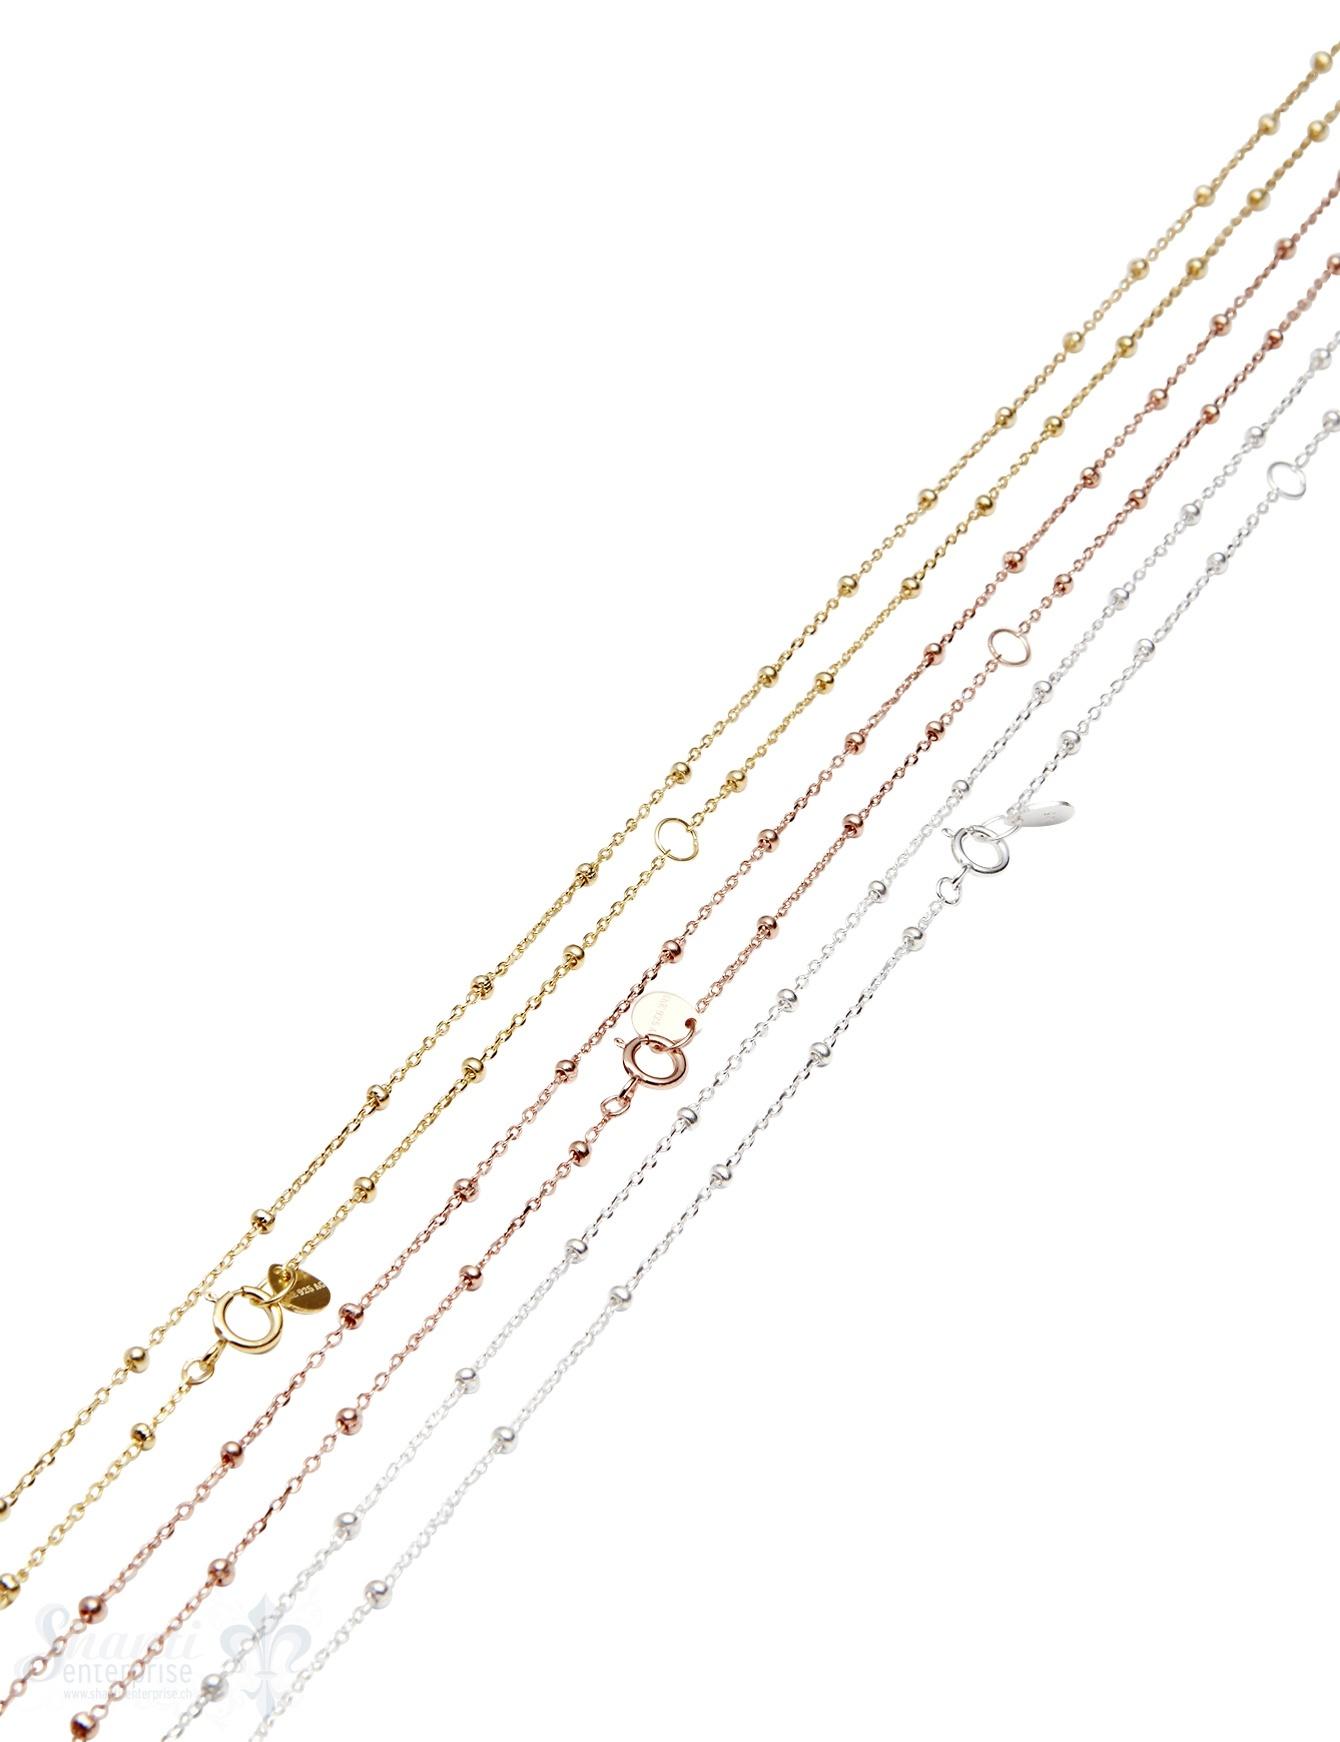 Silberkette Fantasie Anker mit Kugeln 0,7-1,8 mm Grössen verstellbar Federringschloss ec